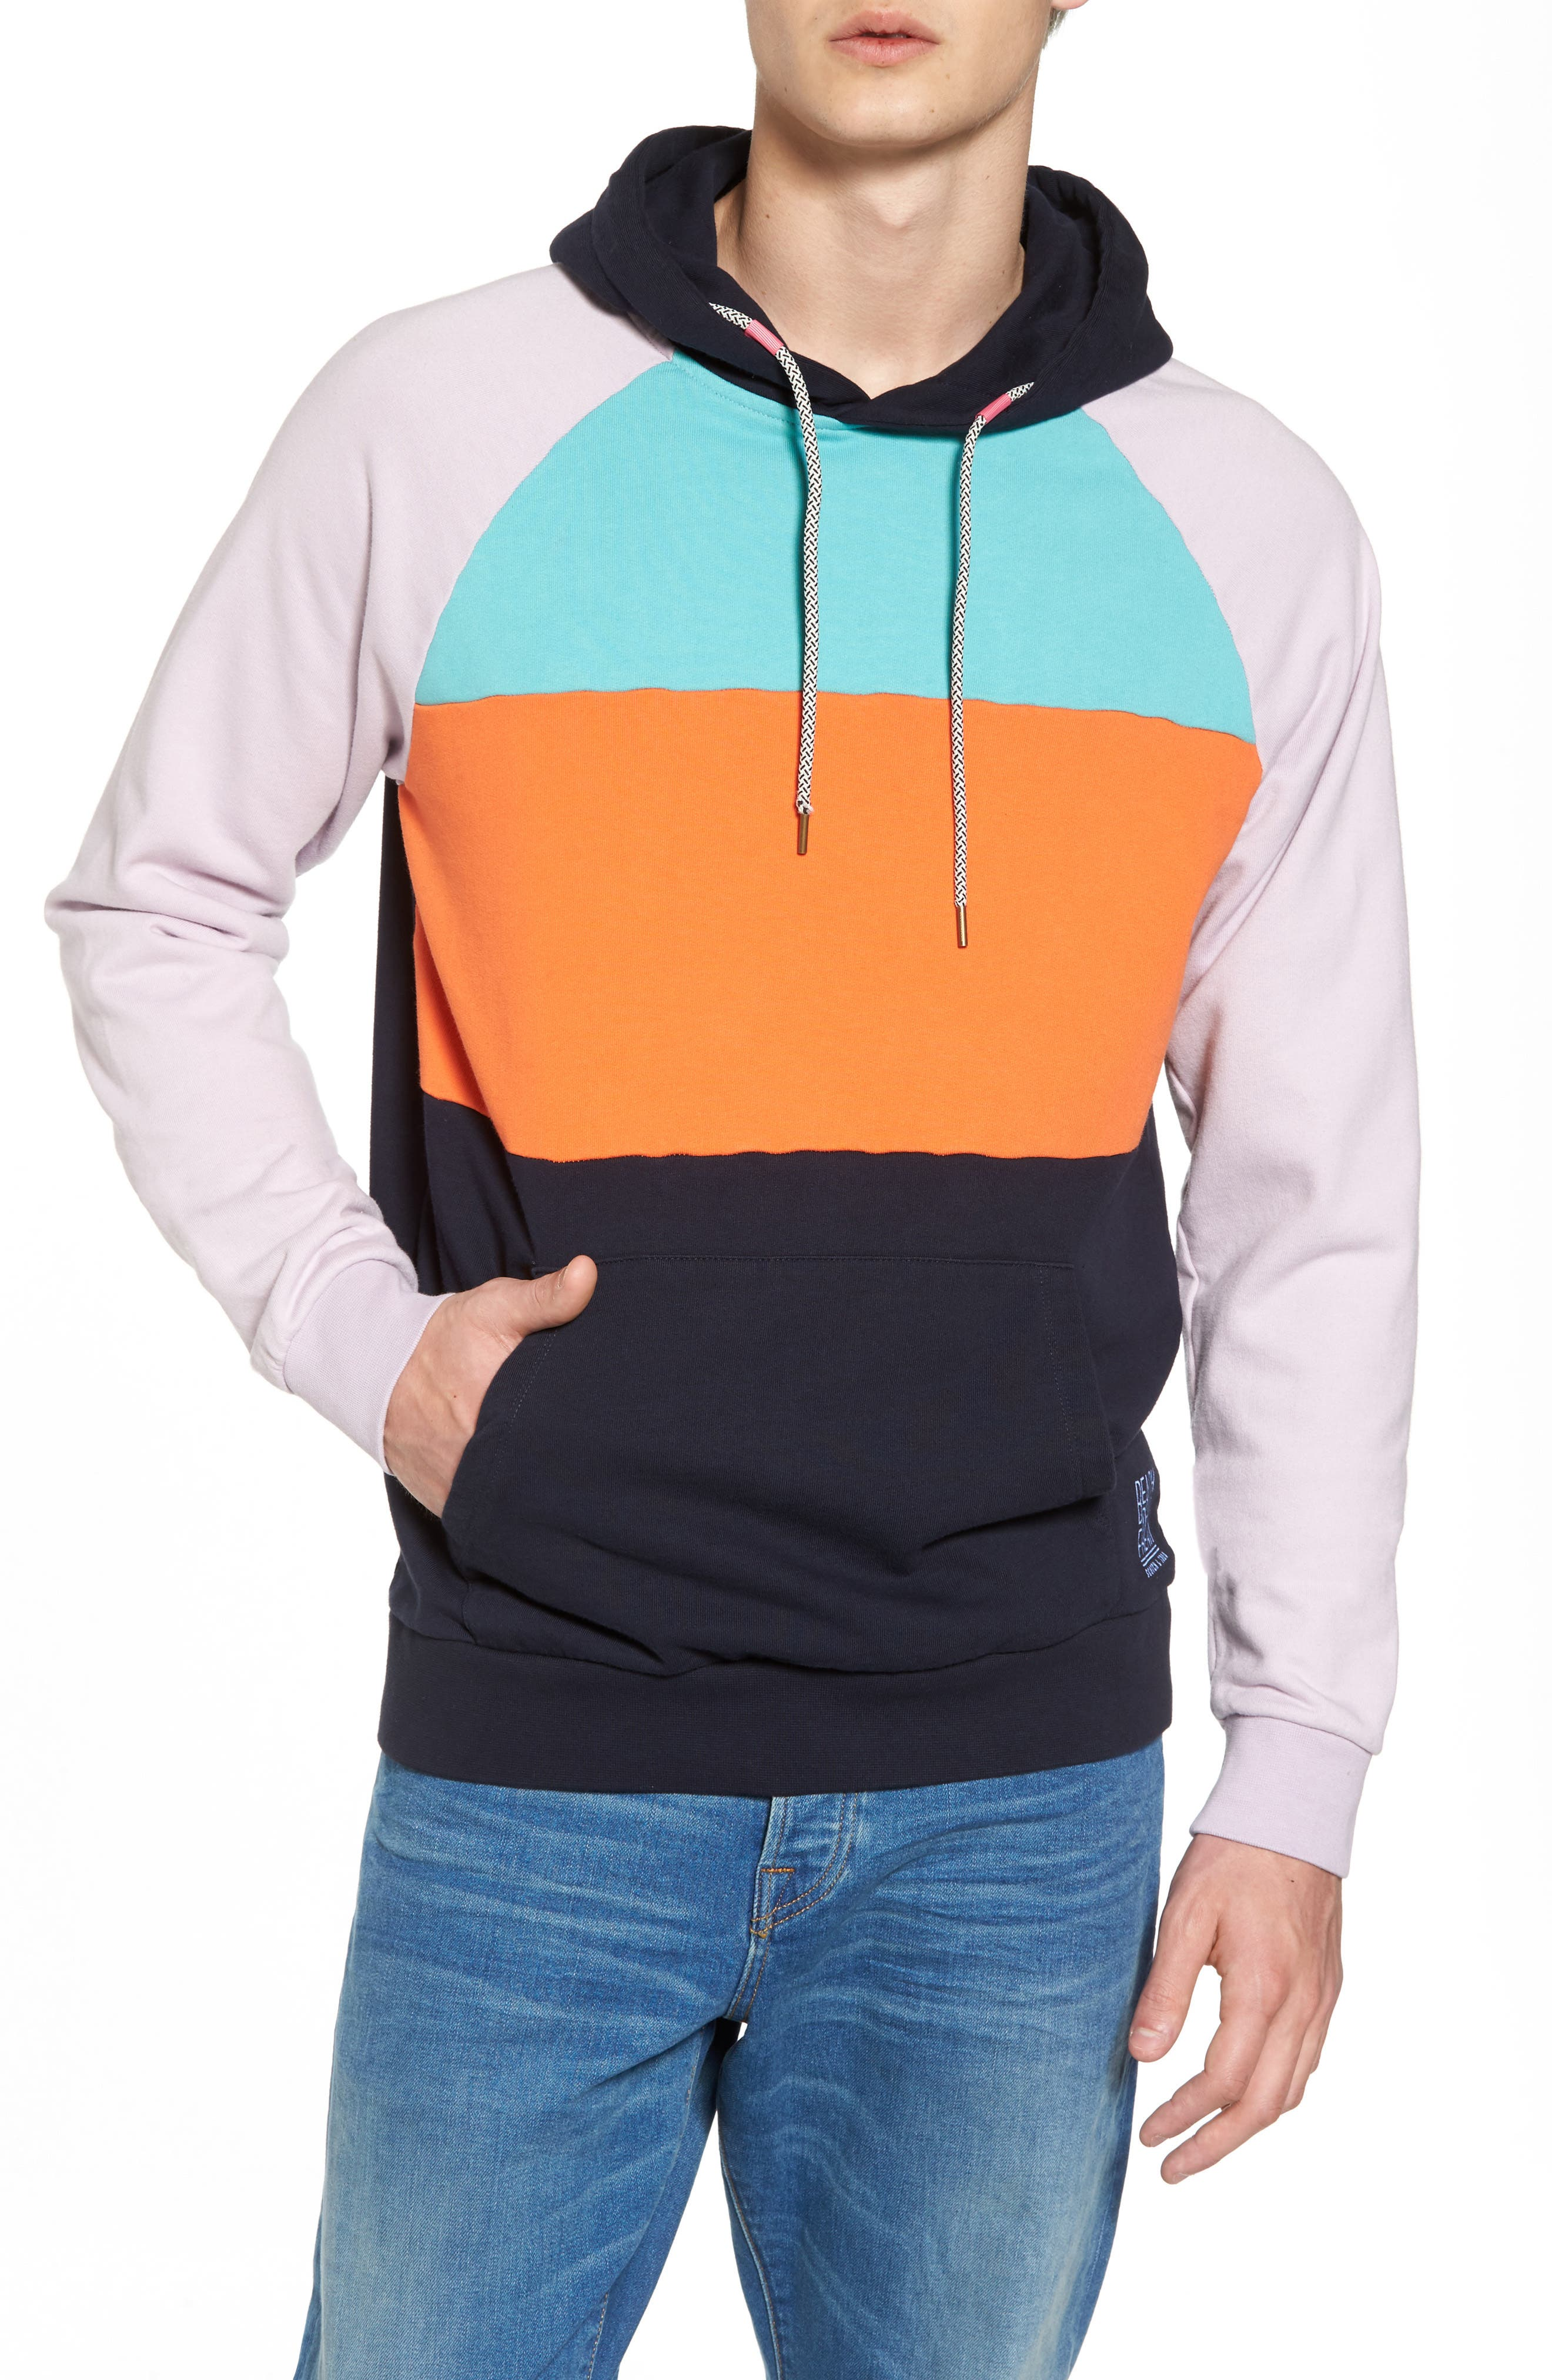 Scotch & Soda Summer Colorblock Hoodie Sweatshirt